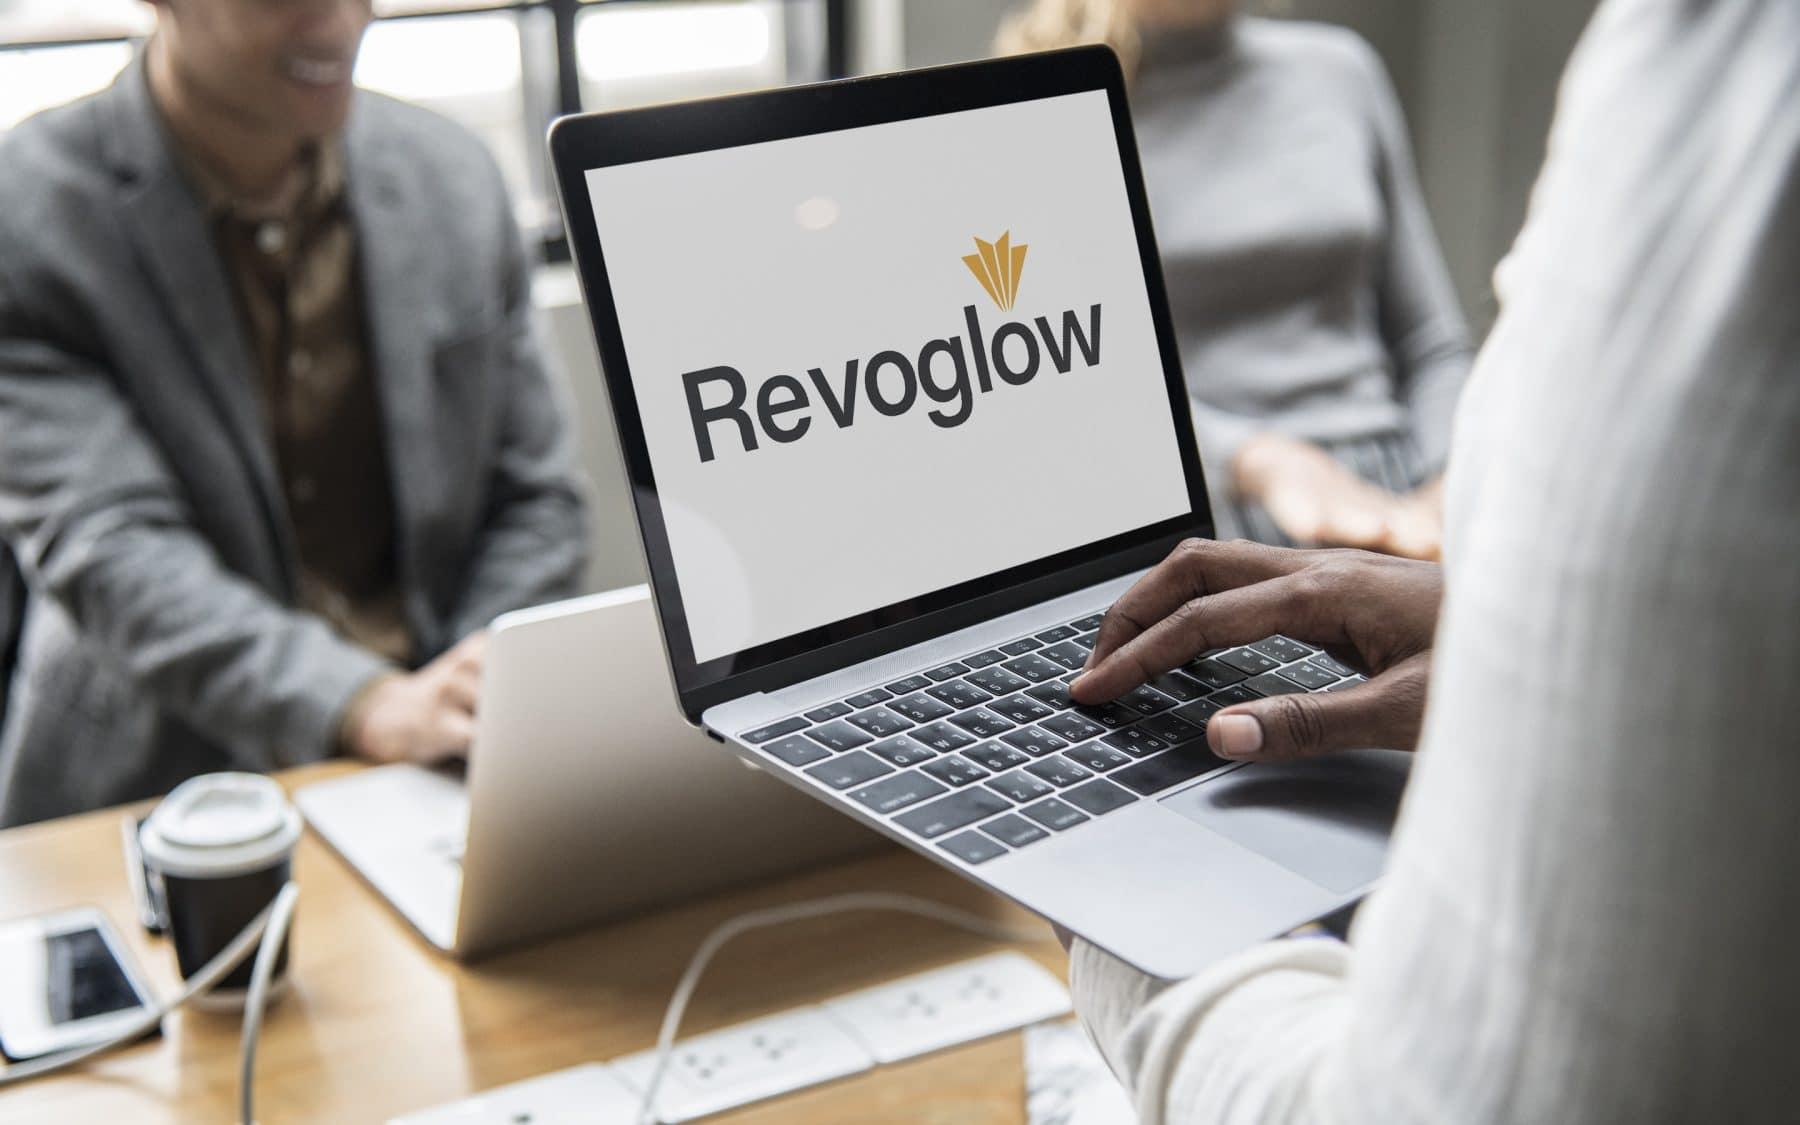 Revoglow 2